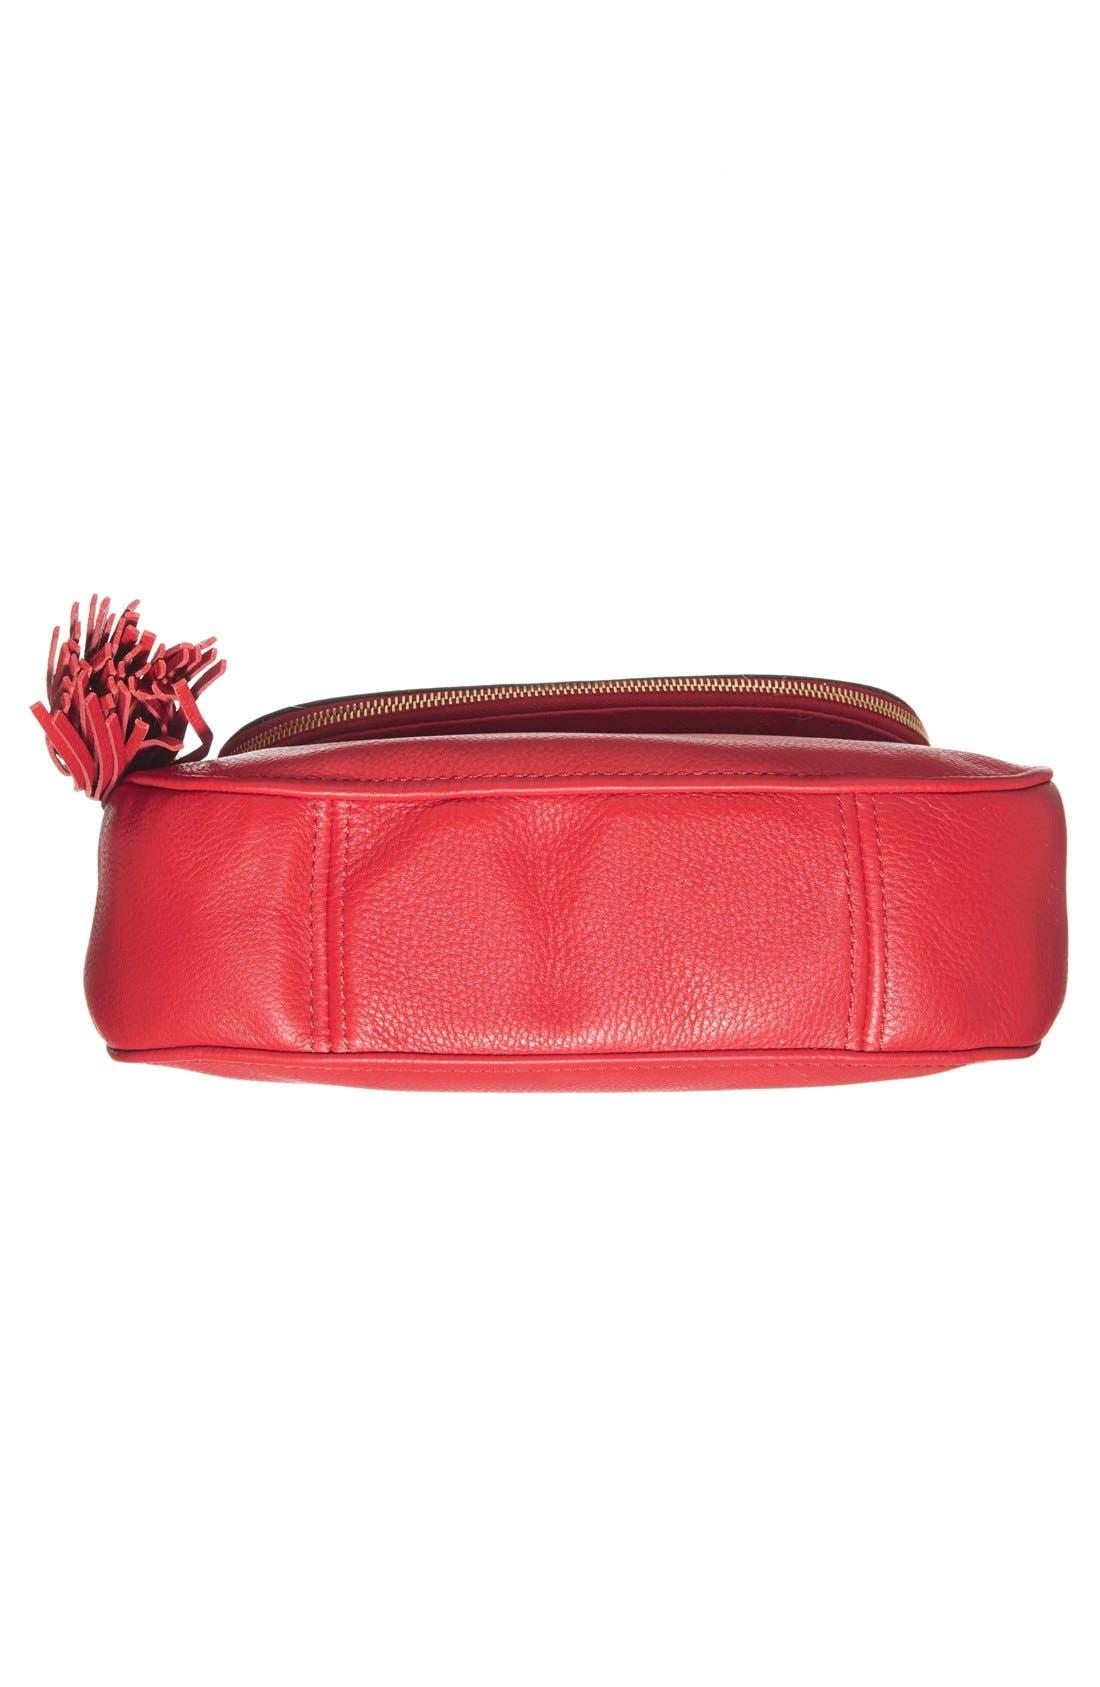 ,                             'Bedford Tassel - Medium' Convertible Leather Shoulder Bag,                             Alternate thumbnail 49, color,                             613